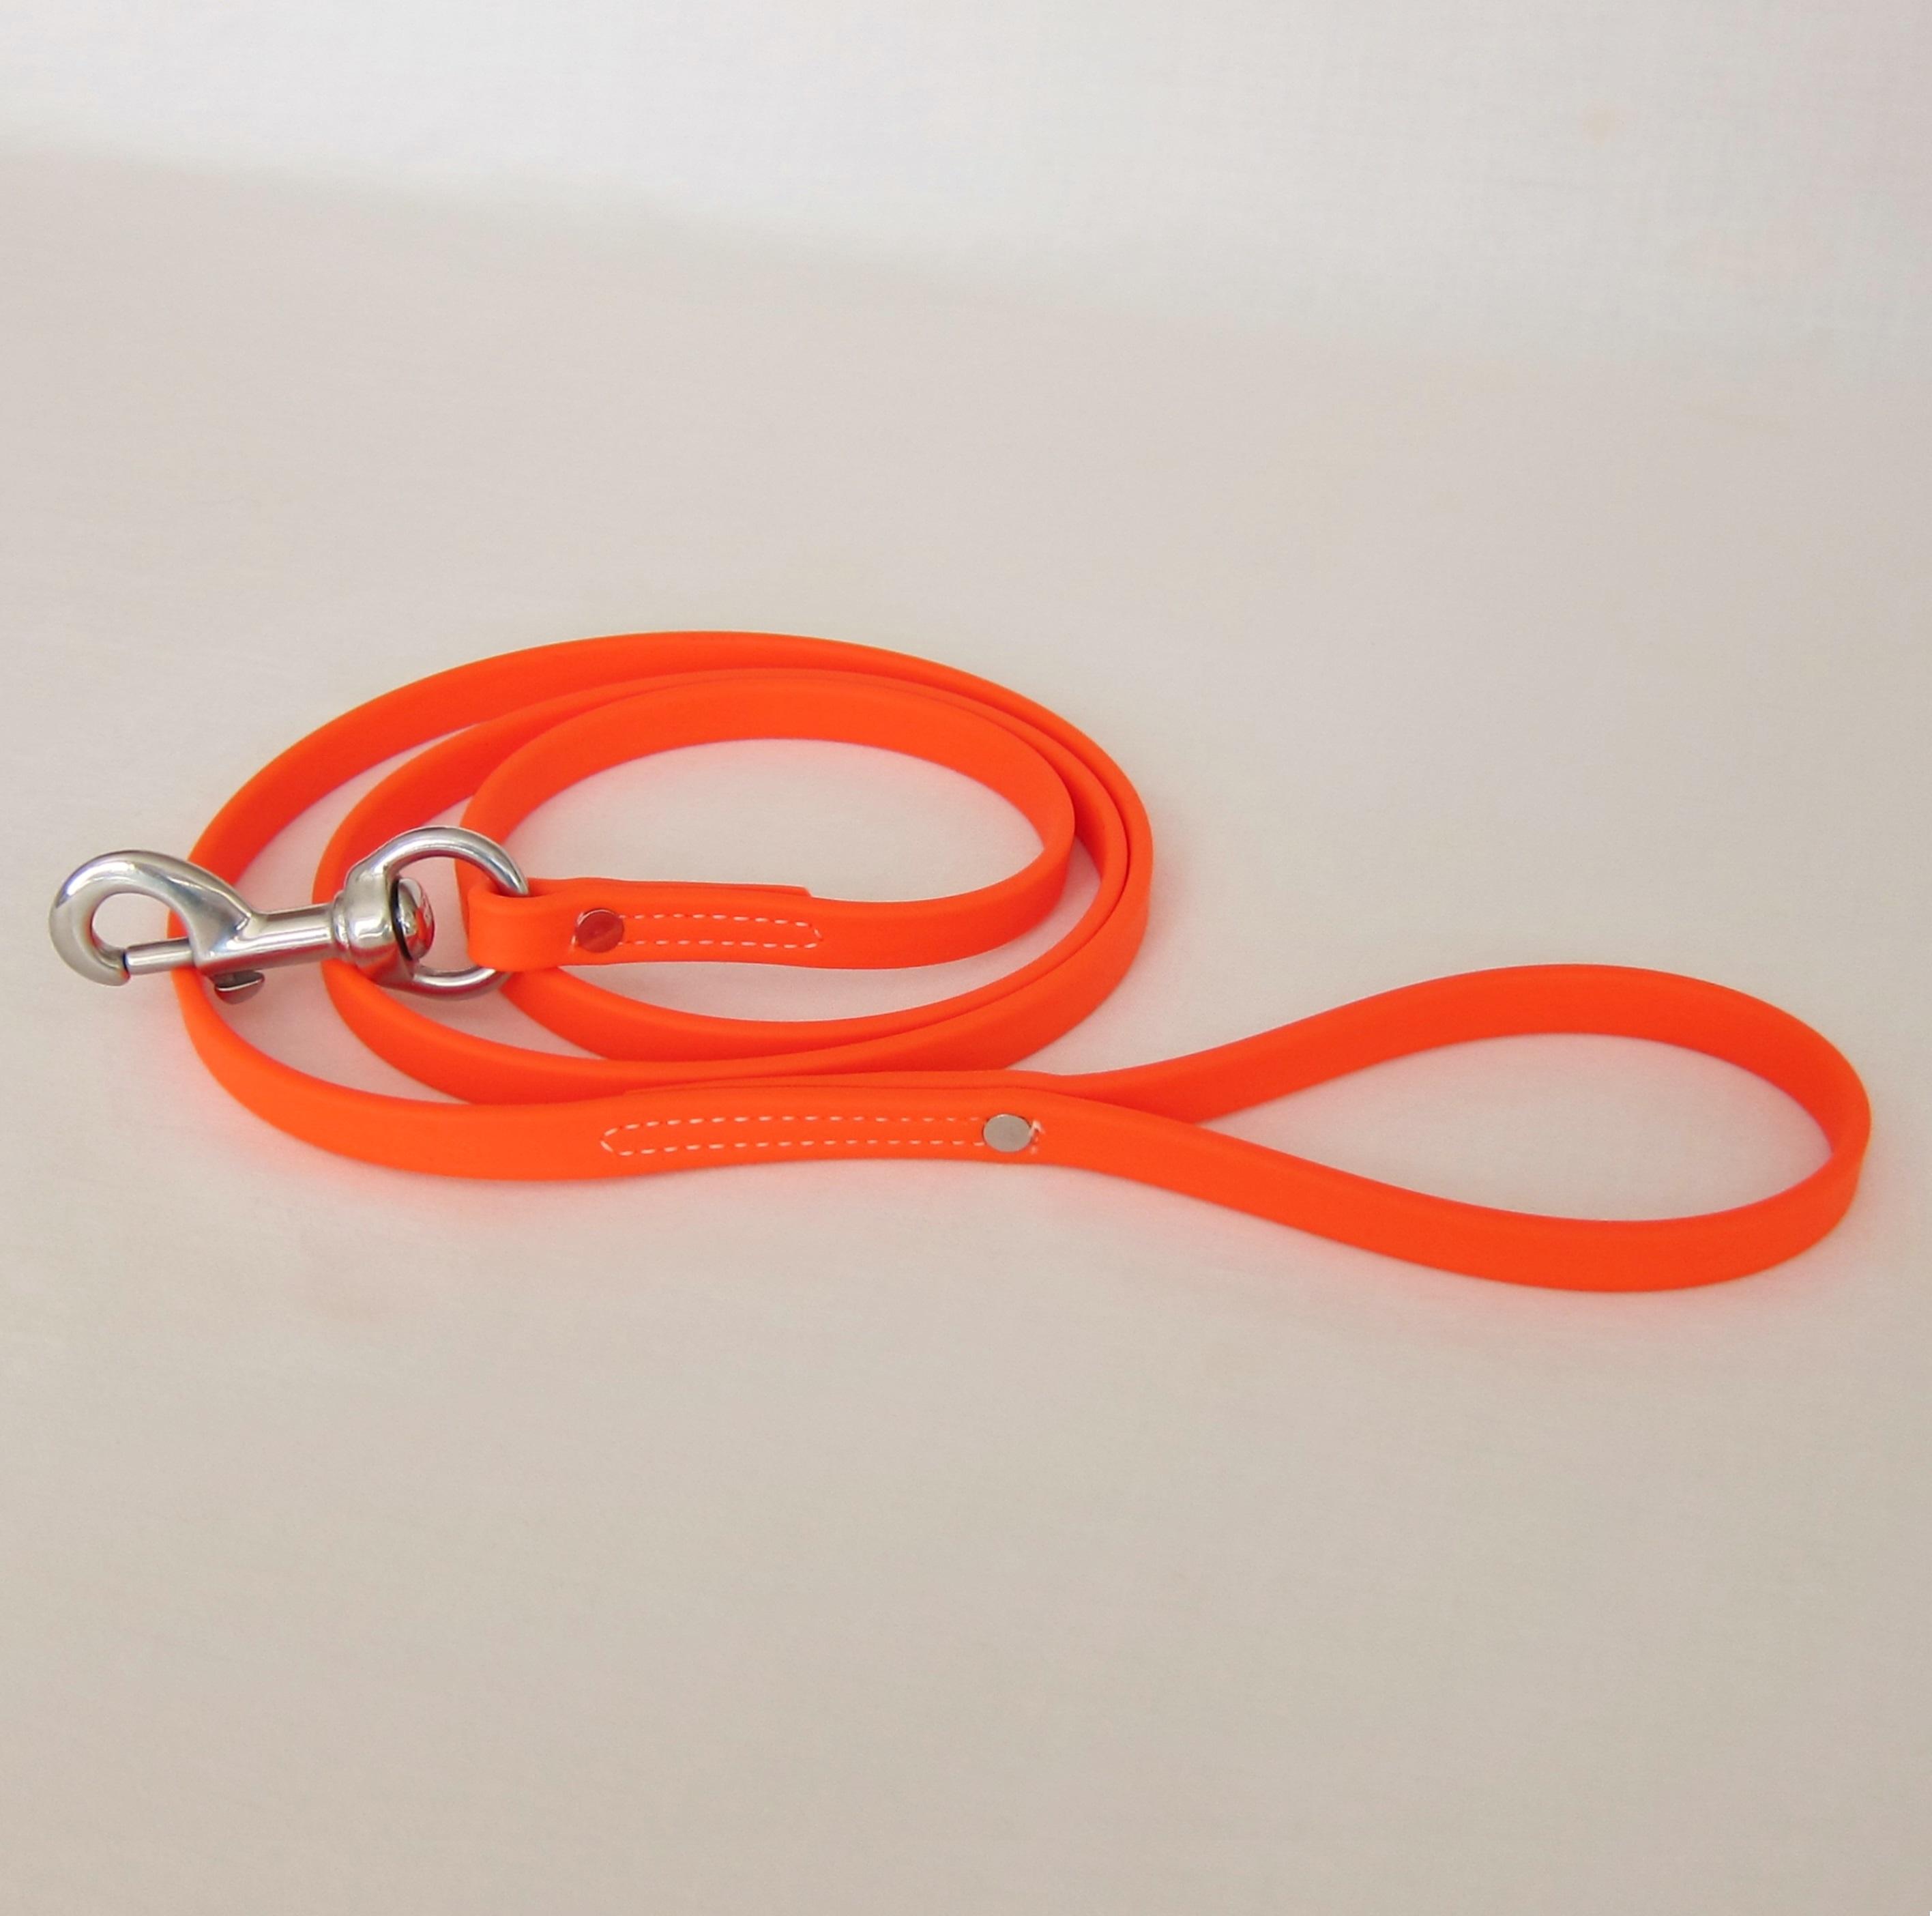 TEAM-K9, dog leash, Biothane leash, dog training leash, light weight leash, mississauga